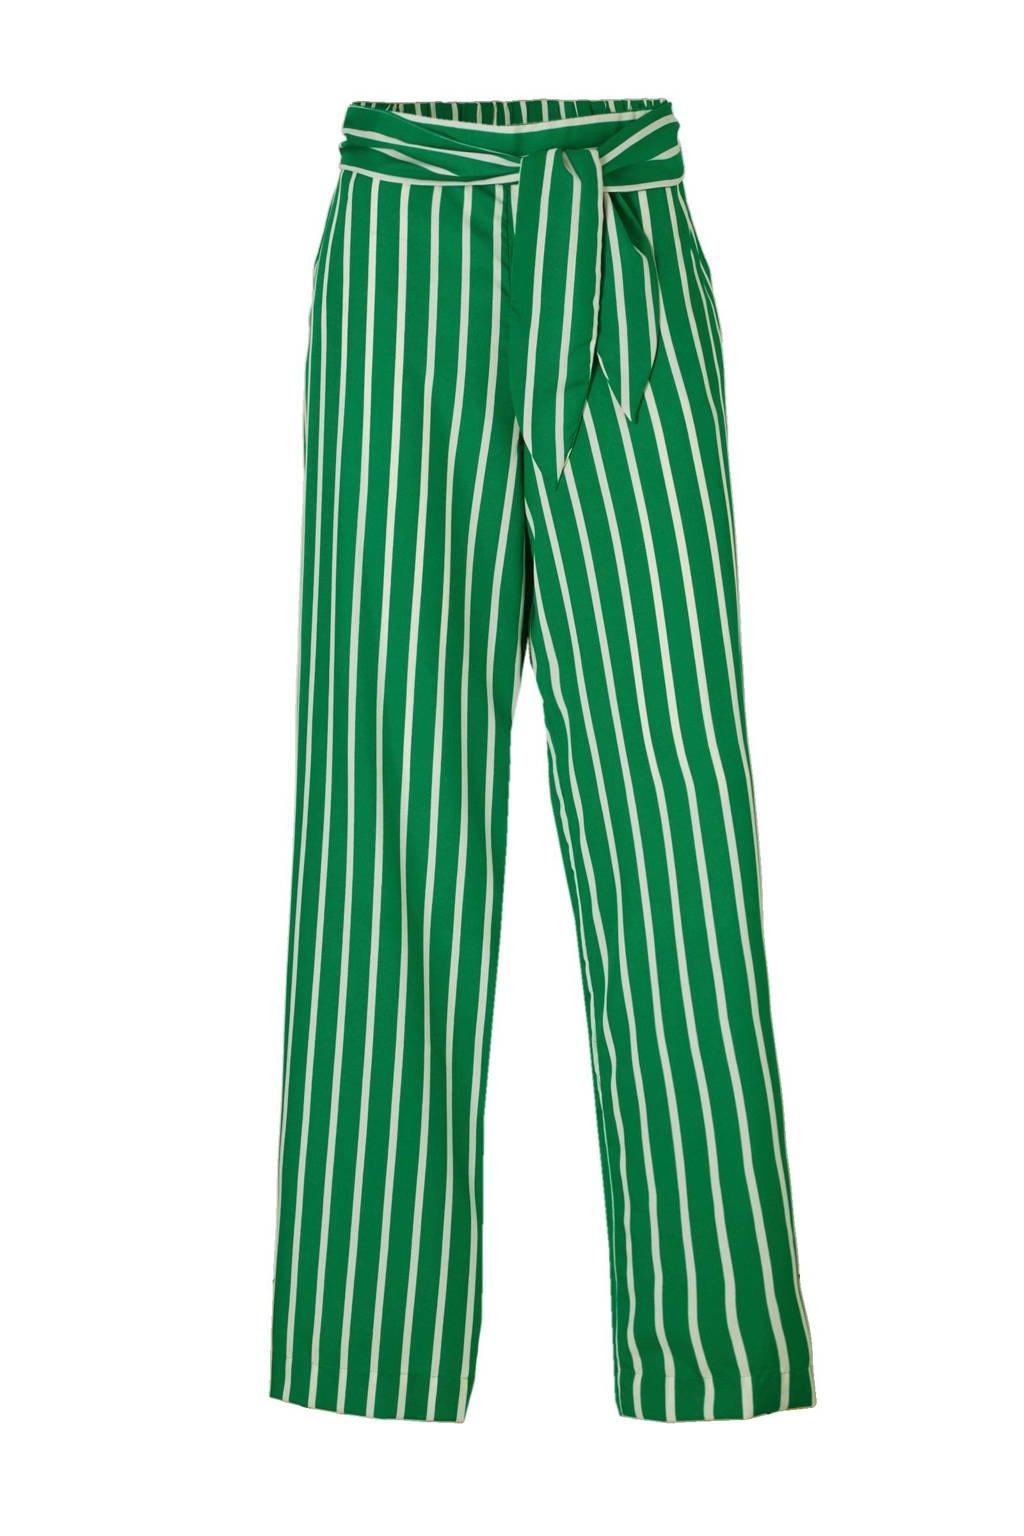 Mango gestreepte palazzo broek met hoge taille, Groen/wit